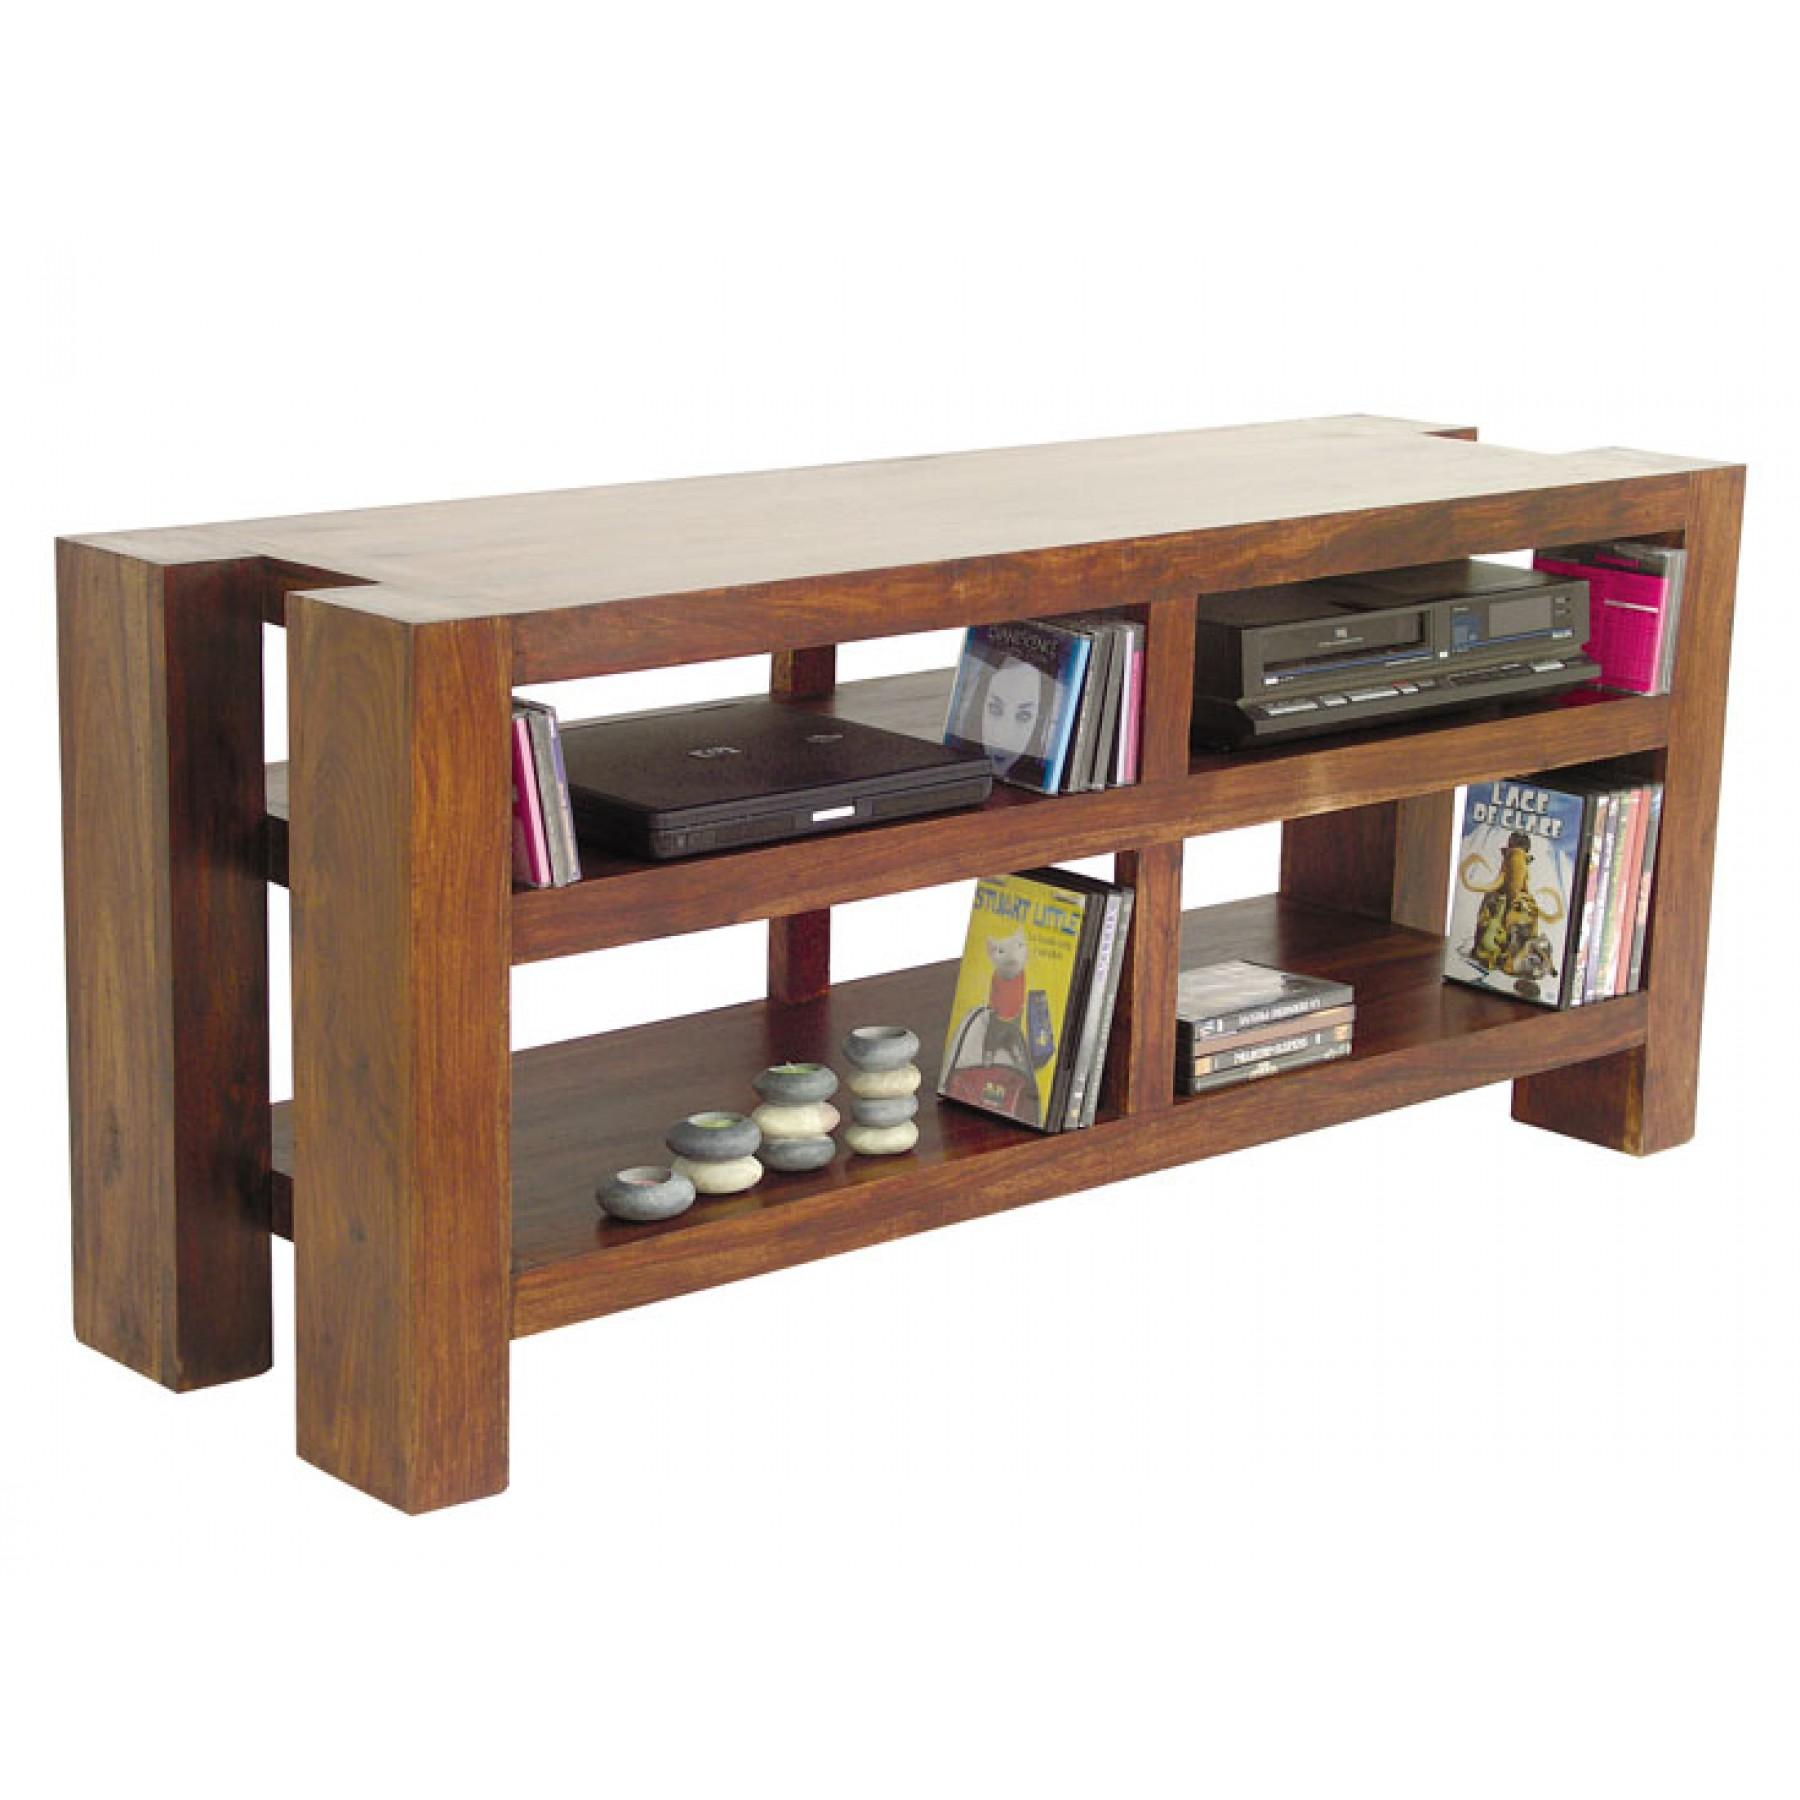 meuble tv 4 niches hindi par nomadde meubles design